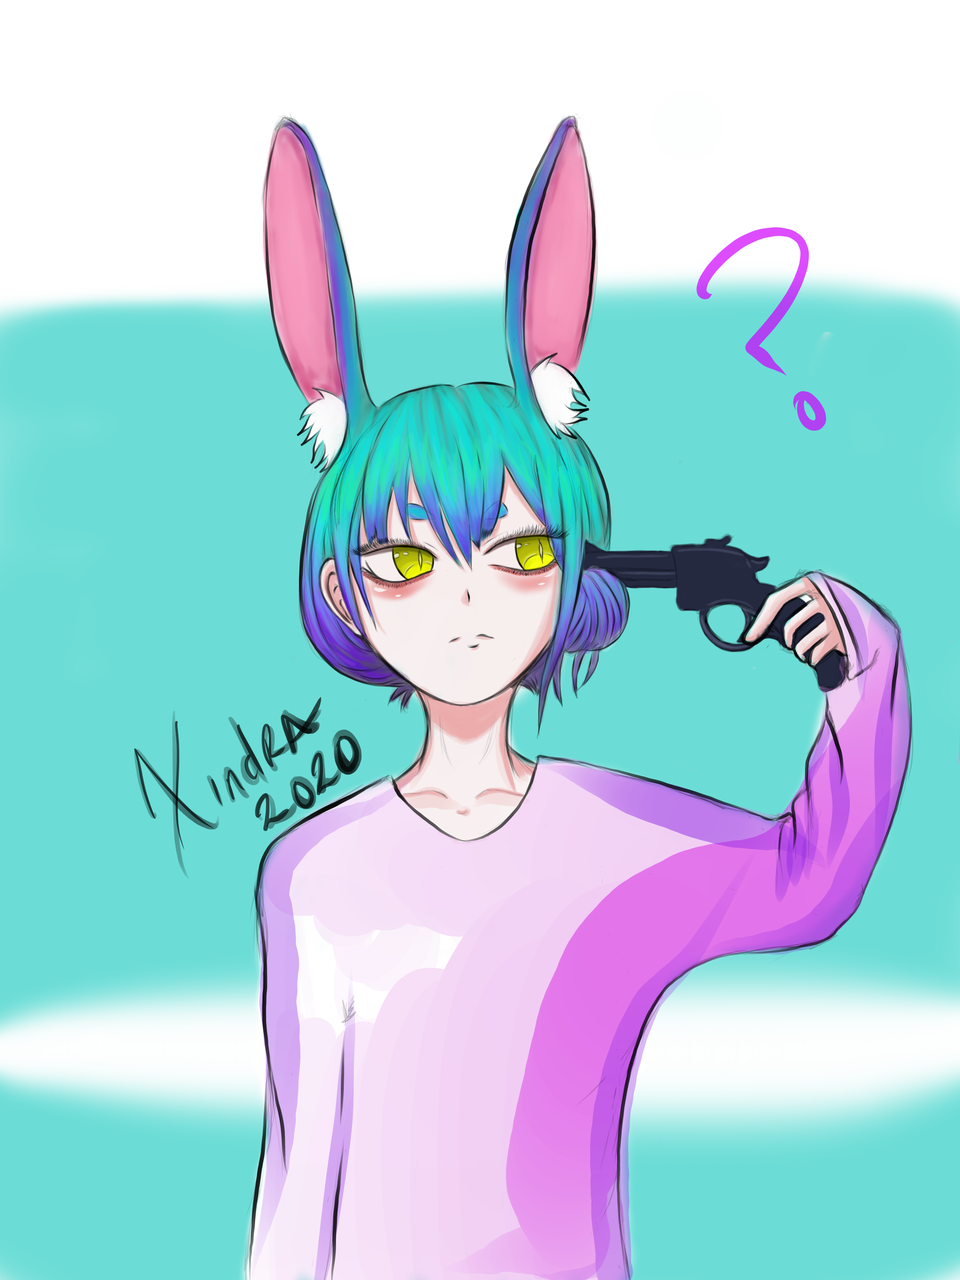 Bunny persona Illust of XinSan medibangpaint bunnygirl